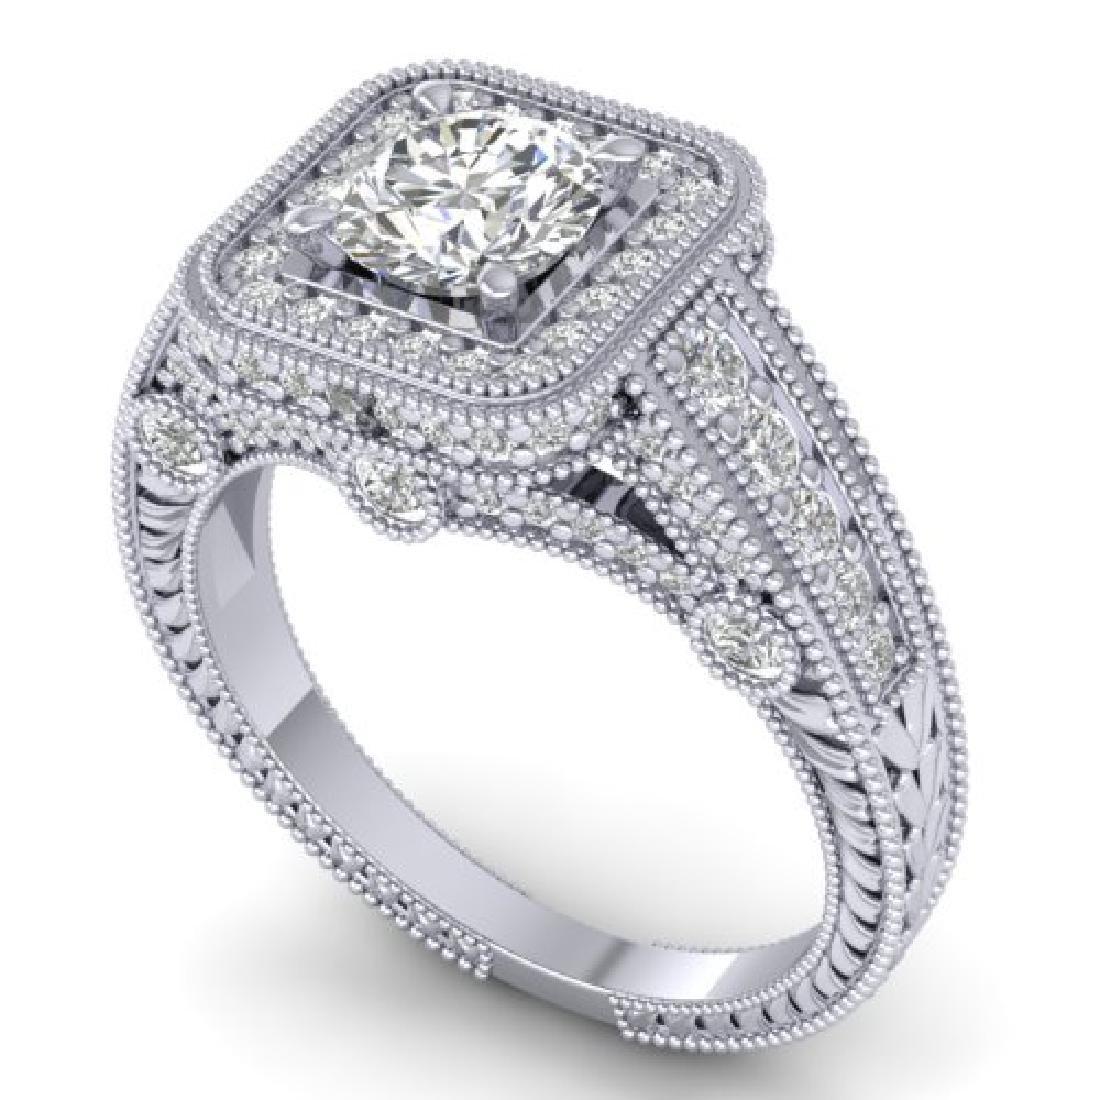 2 CTW Certified VS/SI Diamond Art Deco Halo Ring 18K - 2